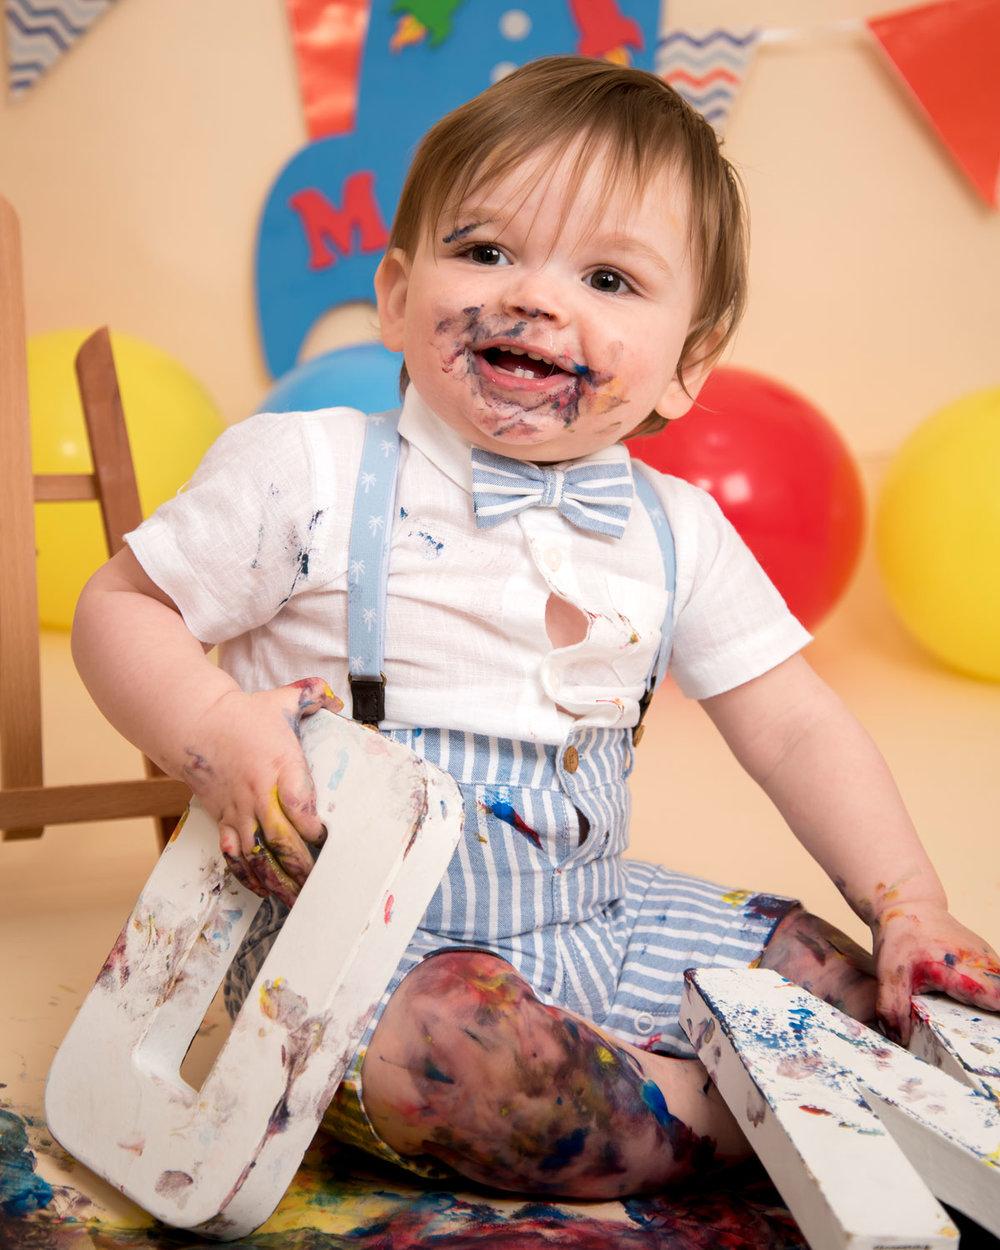 Baby_cake_smash_photography_Ely_Cambridgeshire_paint_splash_cake_smash_alternative_messy_play_first_birthday_for_milo (6).jpg